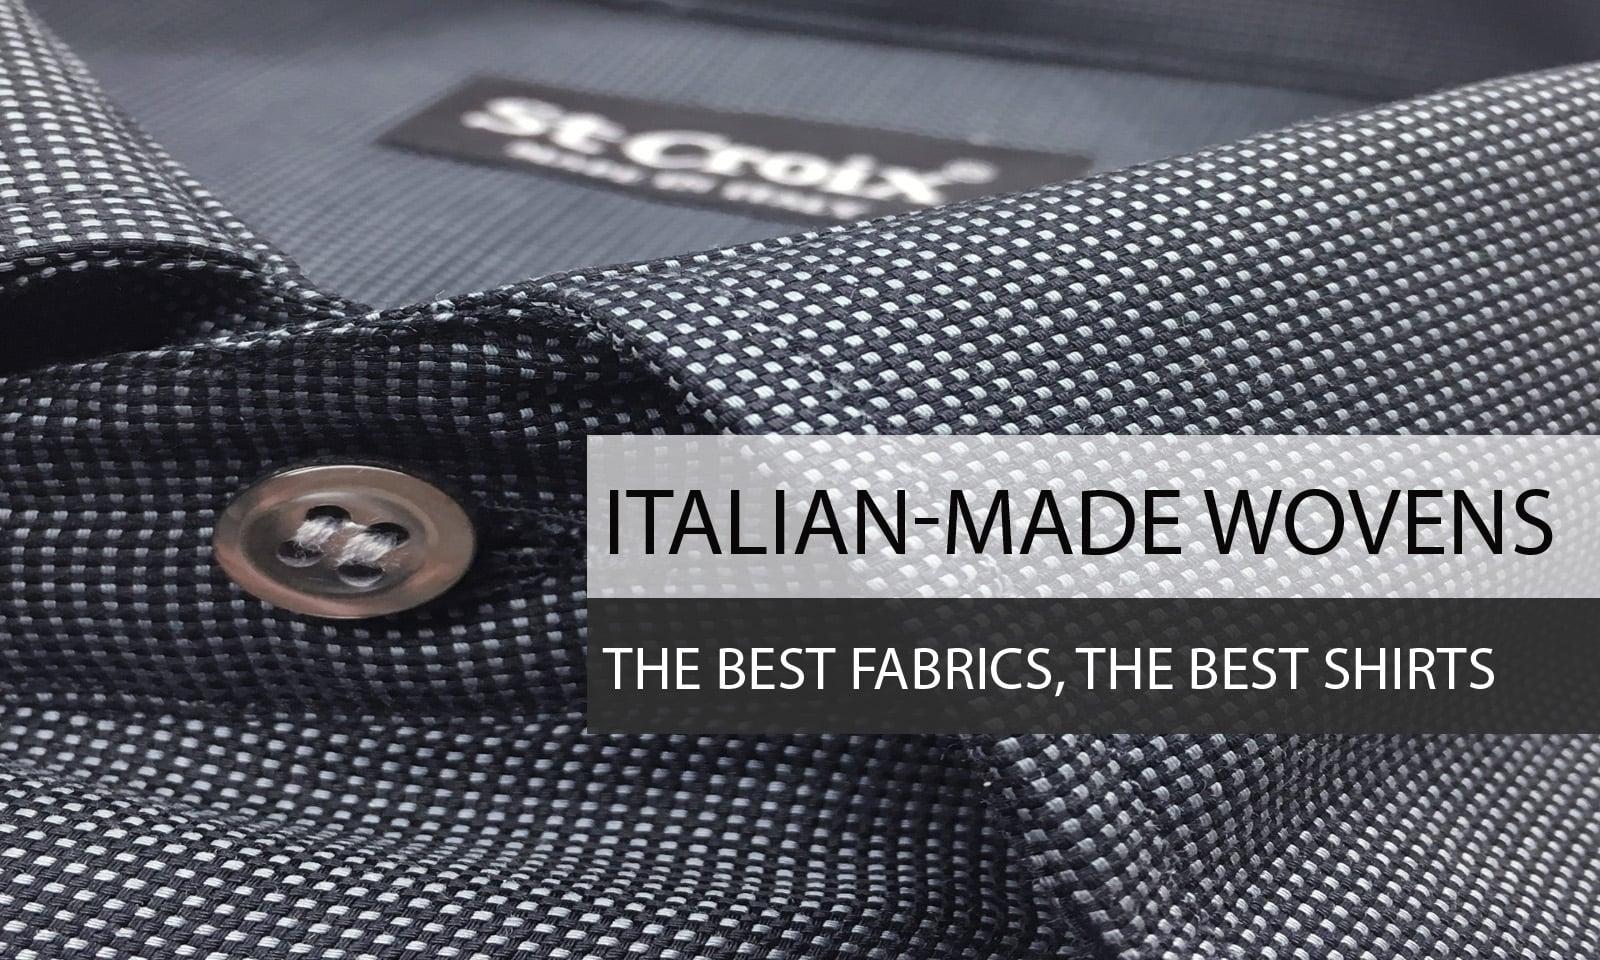 Italian-Made Wovens - The Best Fabrics - The Best Shirts